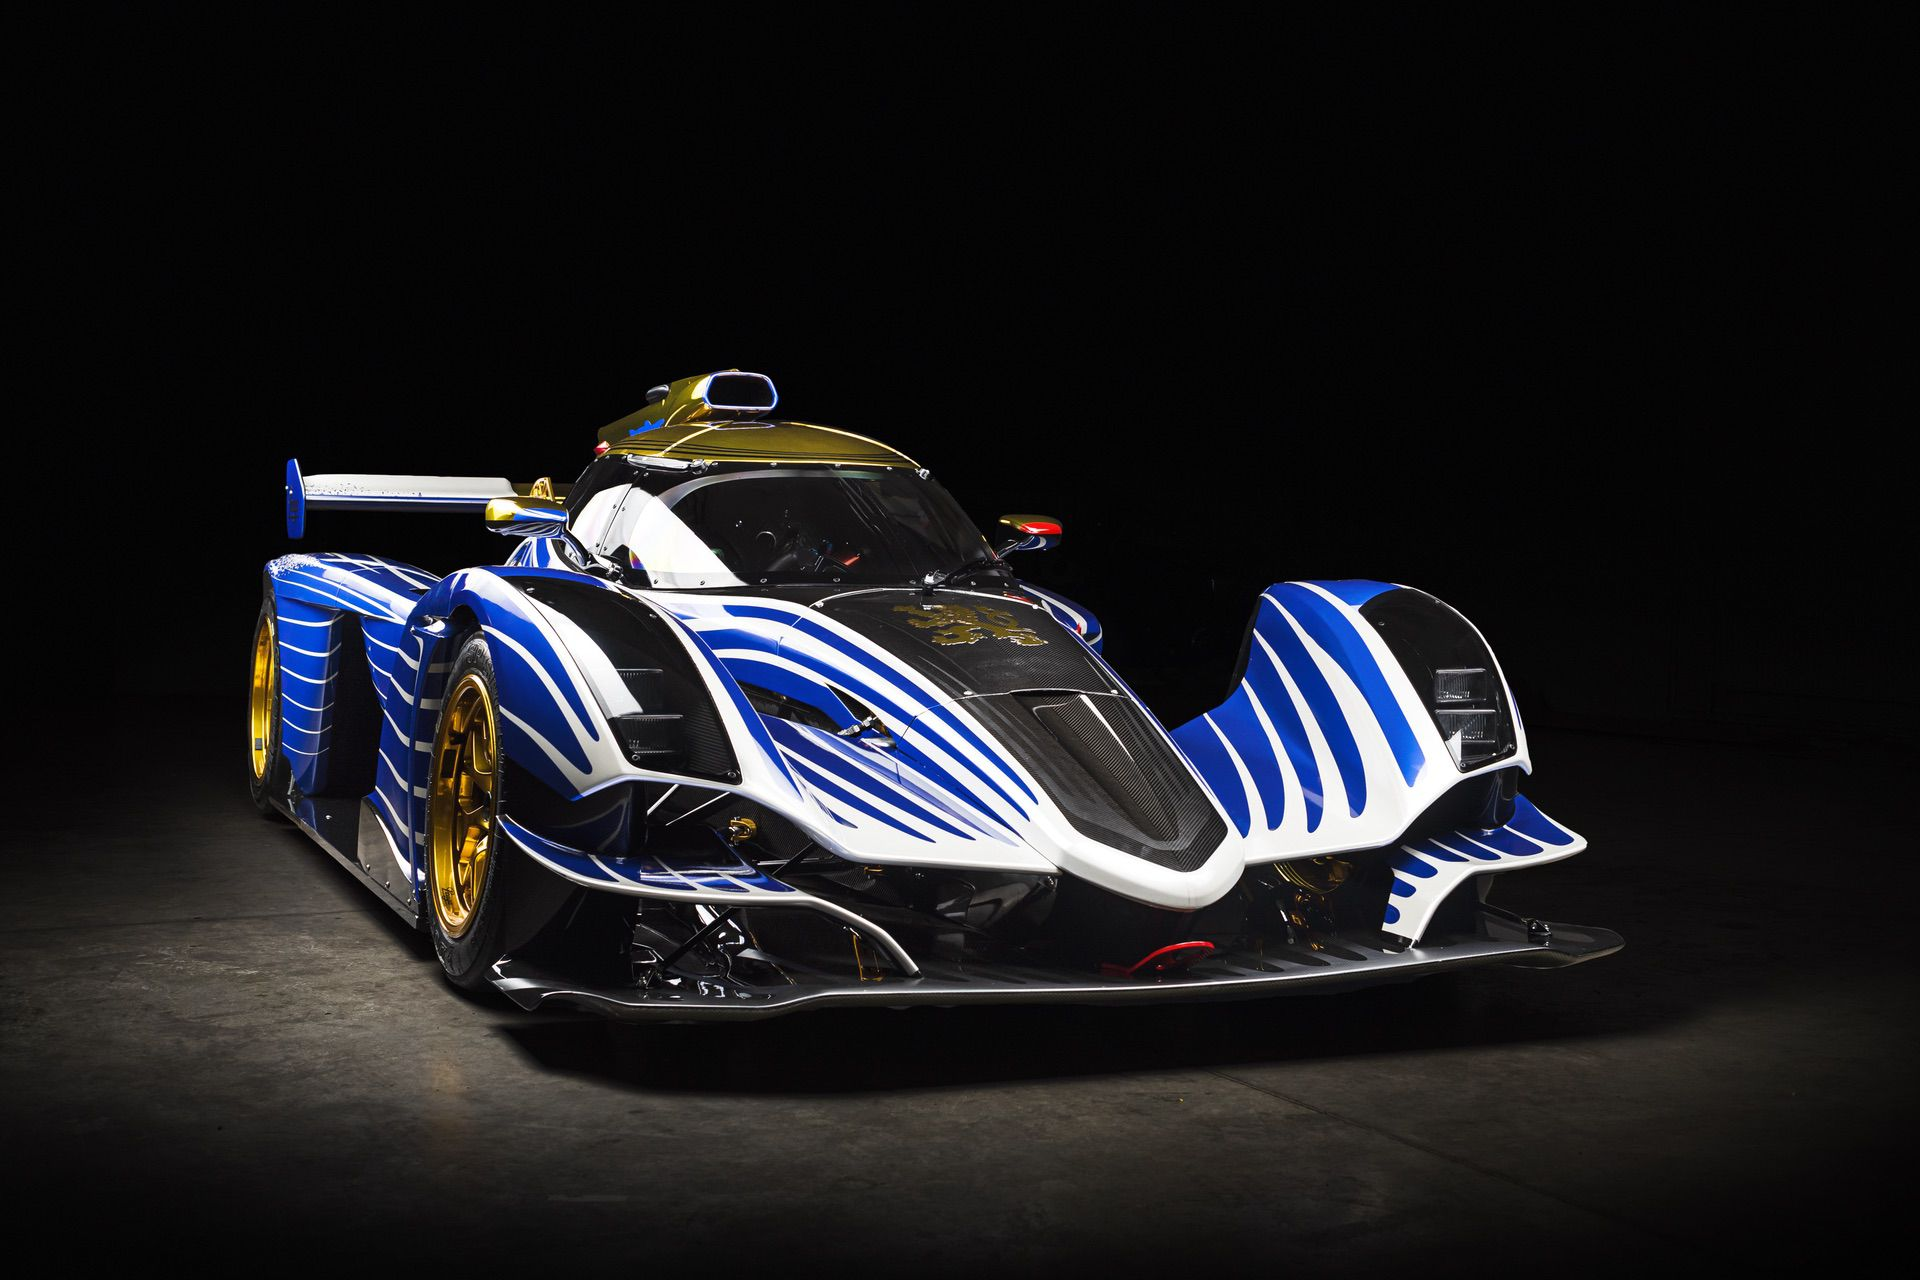 Praga_R1_Frank_Stephenson_racing_livery-0016